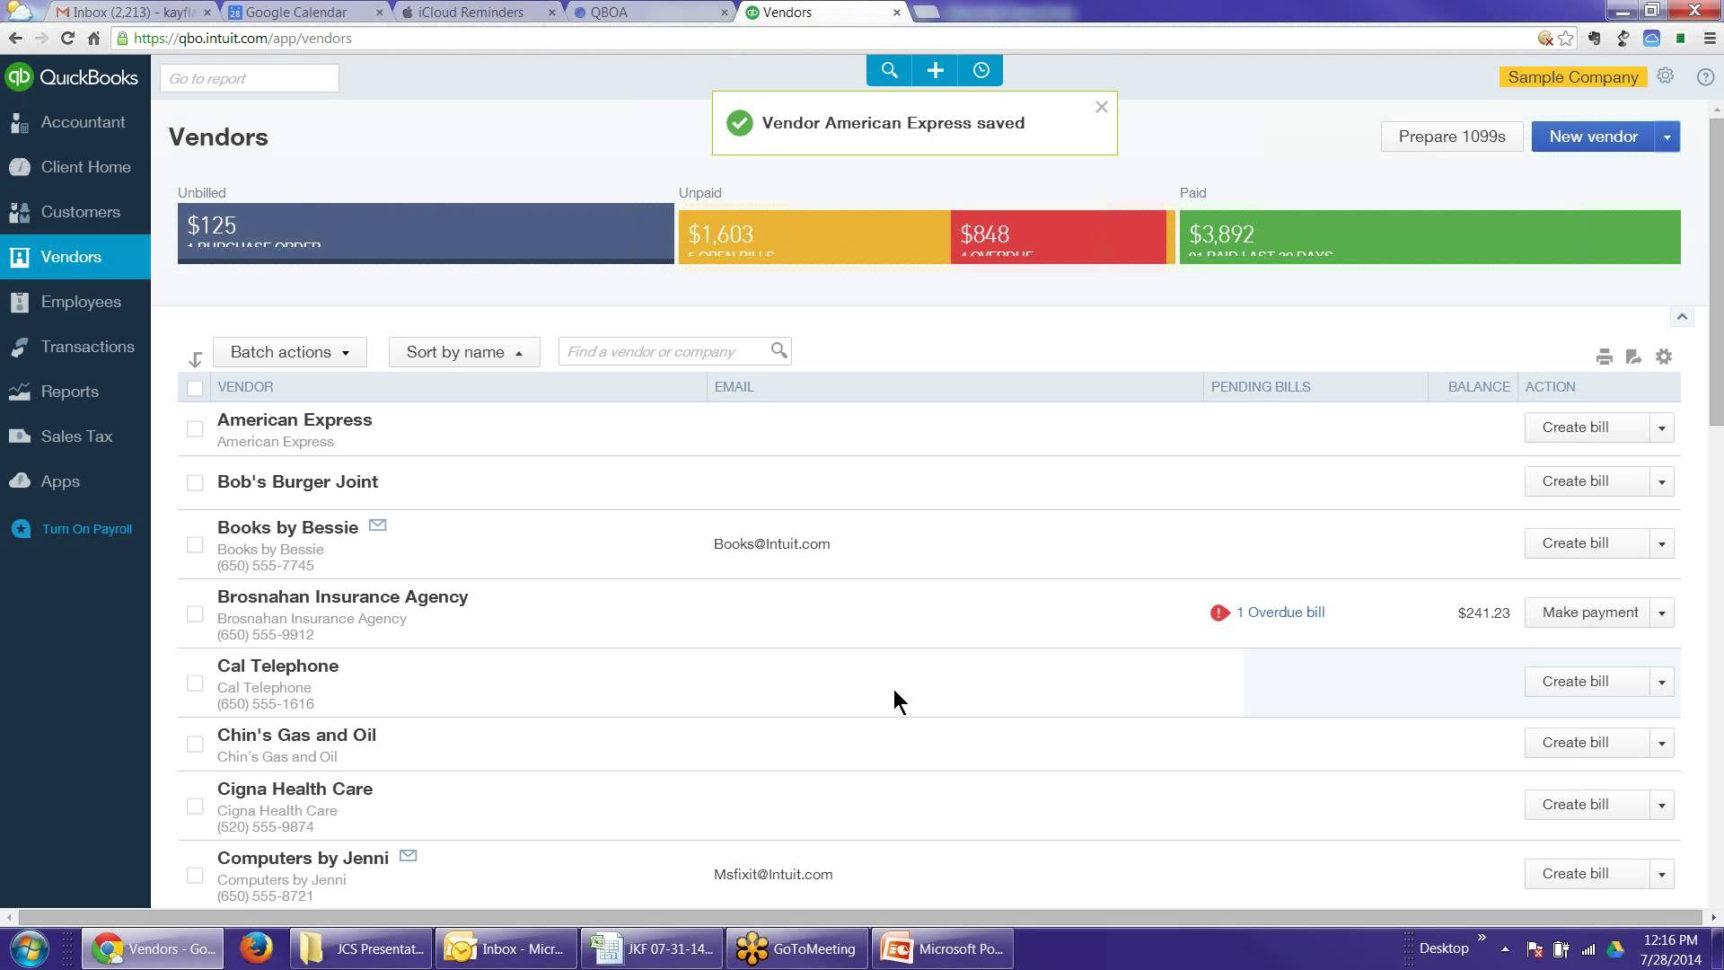 Free Online Business Expense Tracker Online Business Expense Tracker Within Online Business Expense Tracker